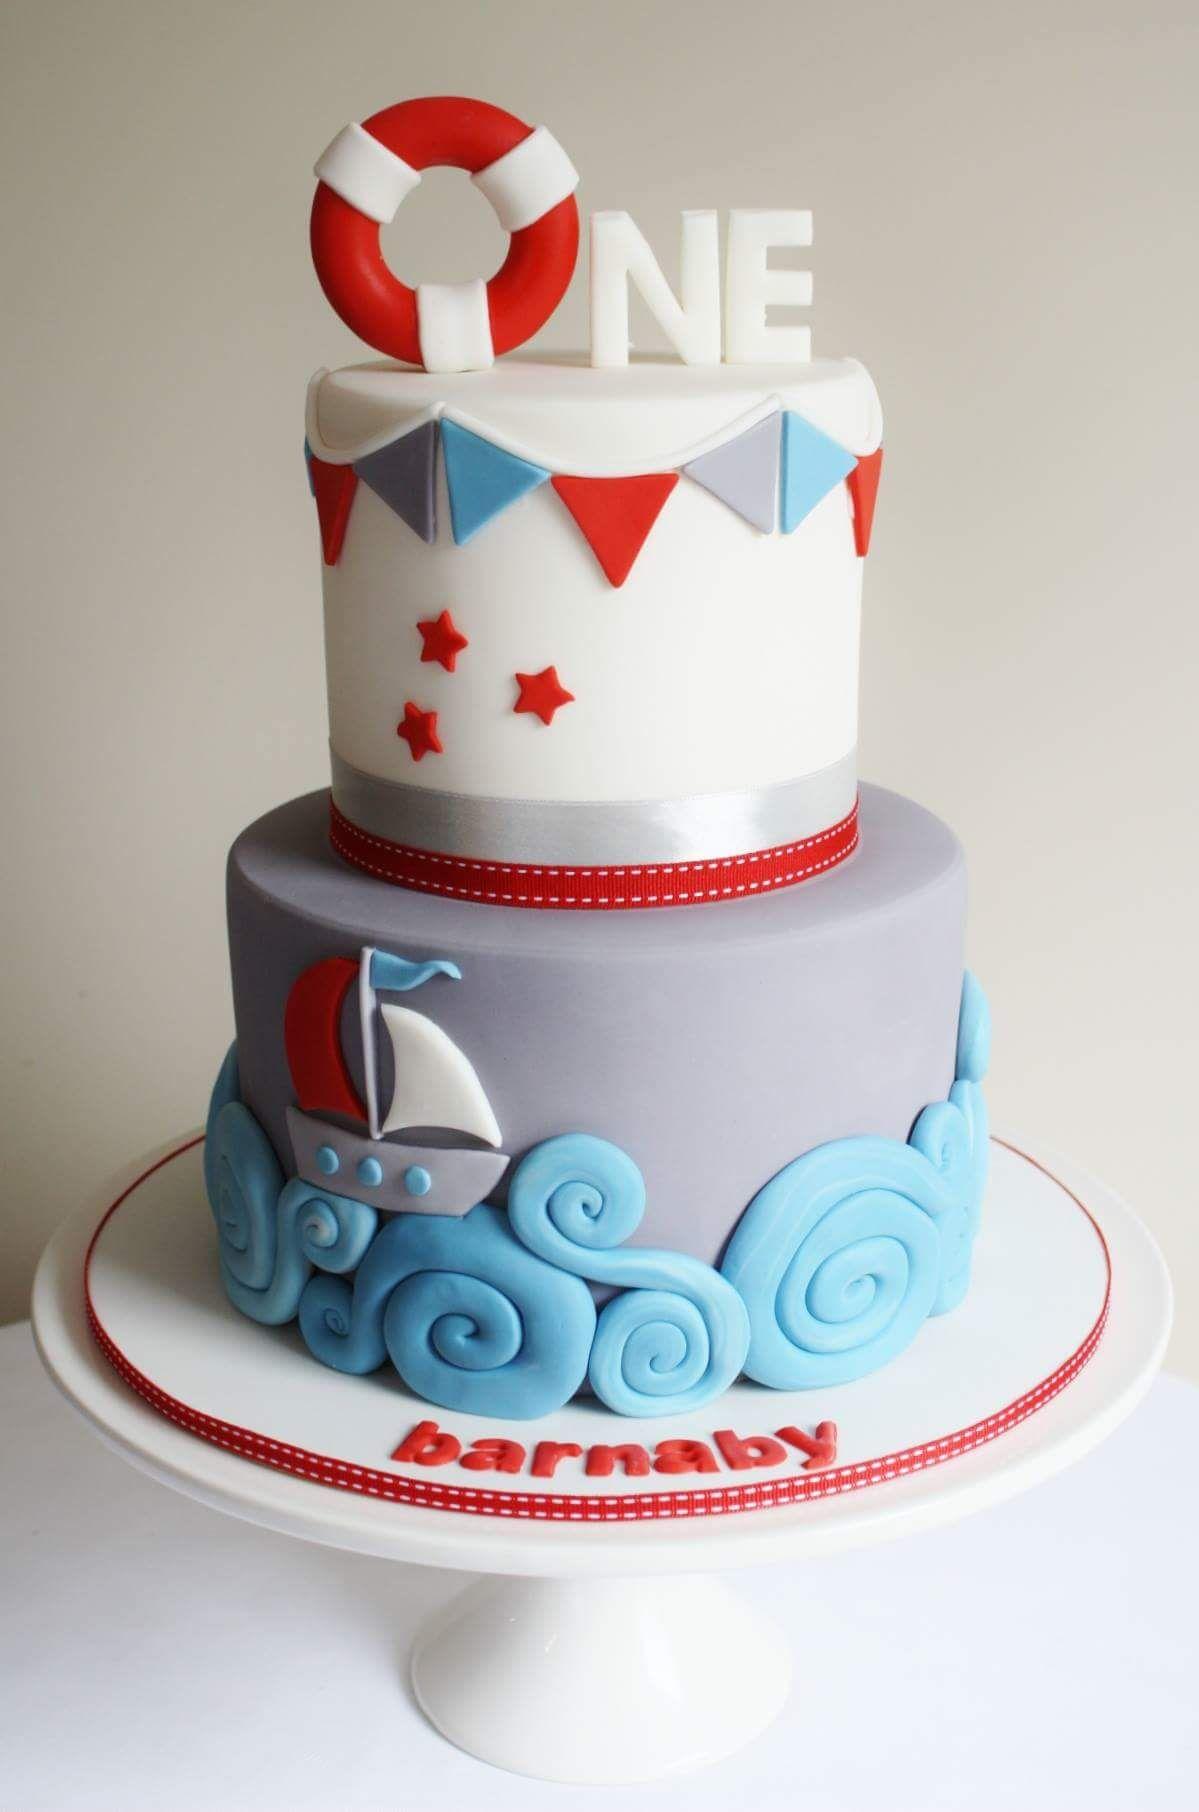 Pin By Komal Shroff On Theme Cakes Cake Birthday Cake Birthday